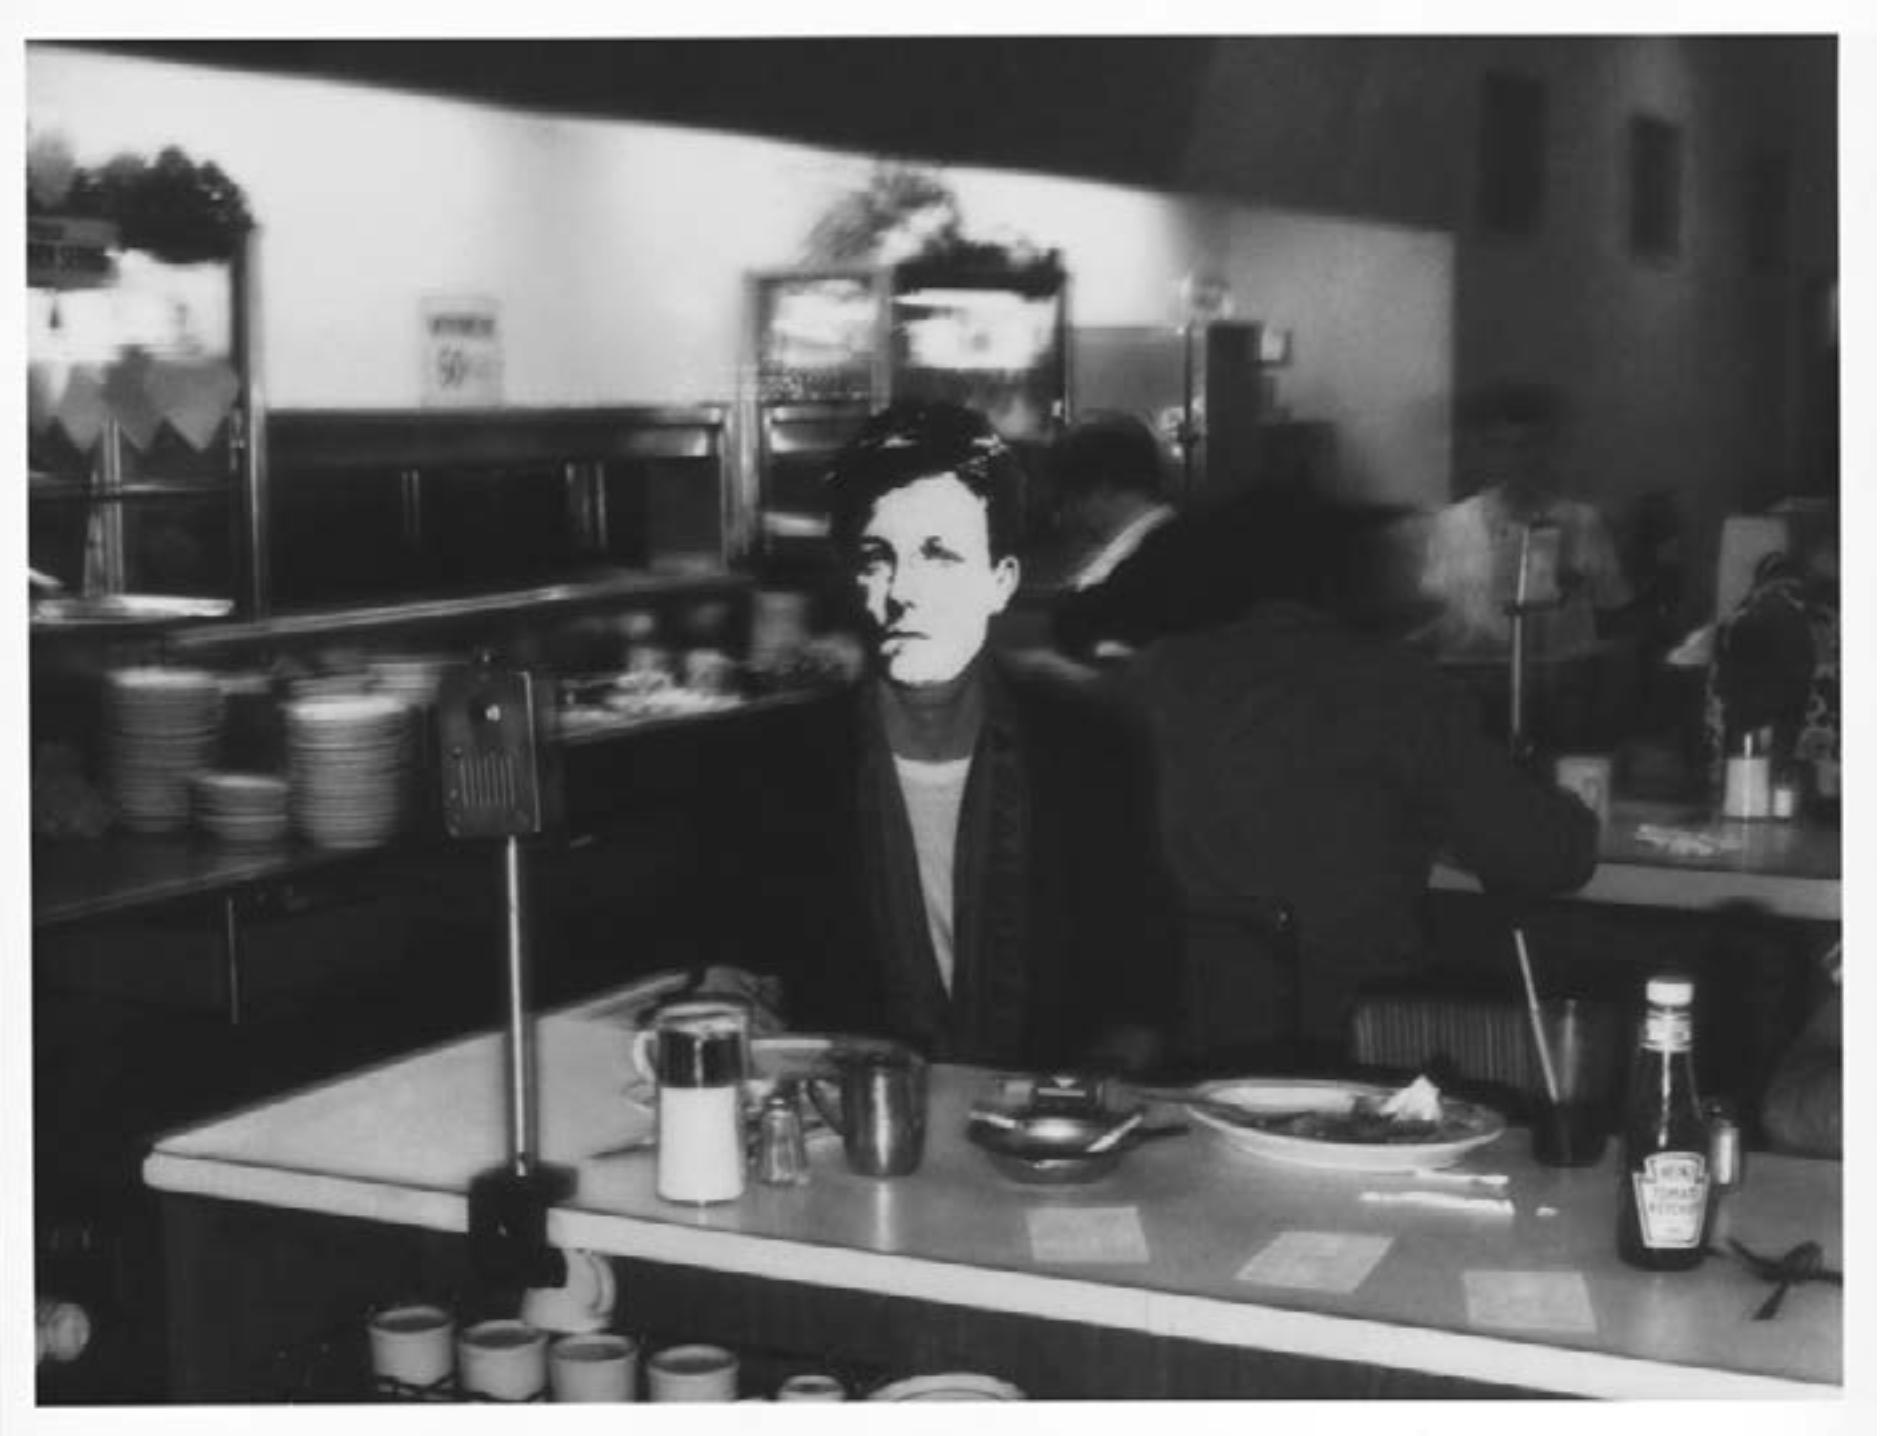 David Wojnarovicz,  Arthur Rimbaud in New York (diner) , 1978-79/2004